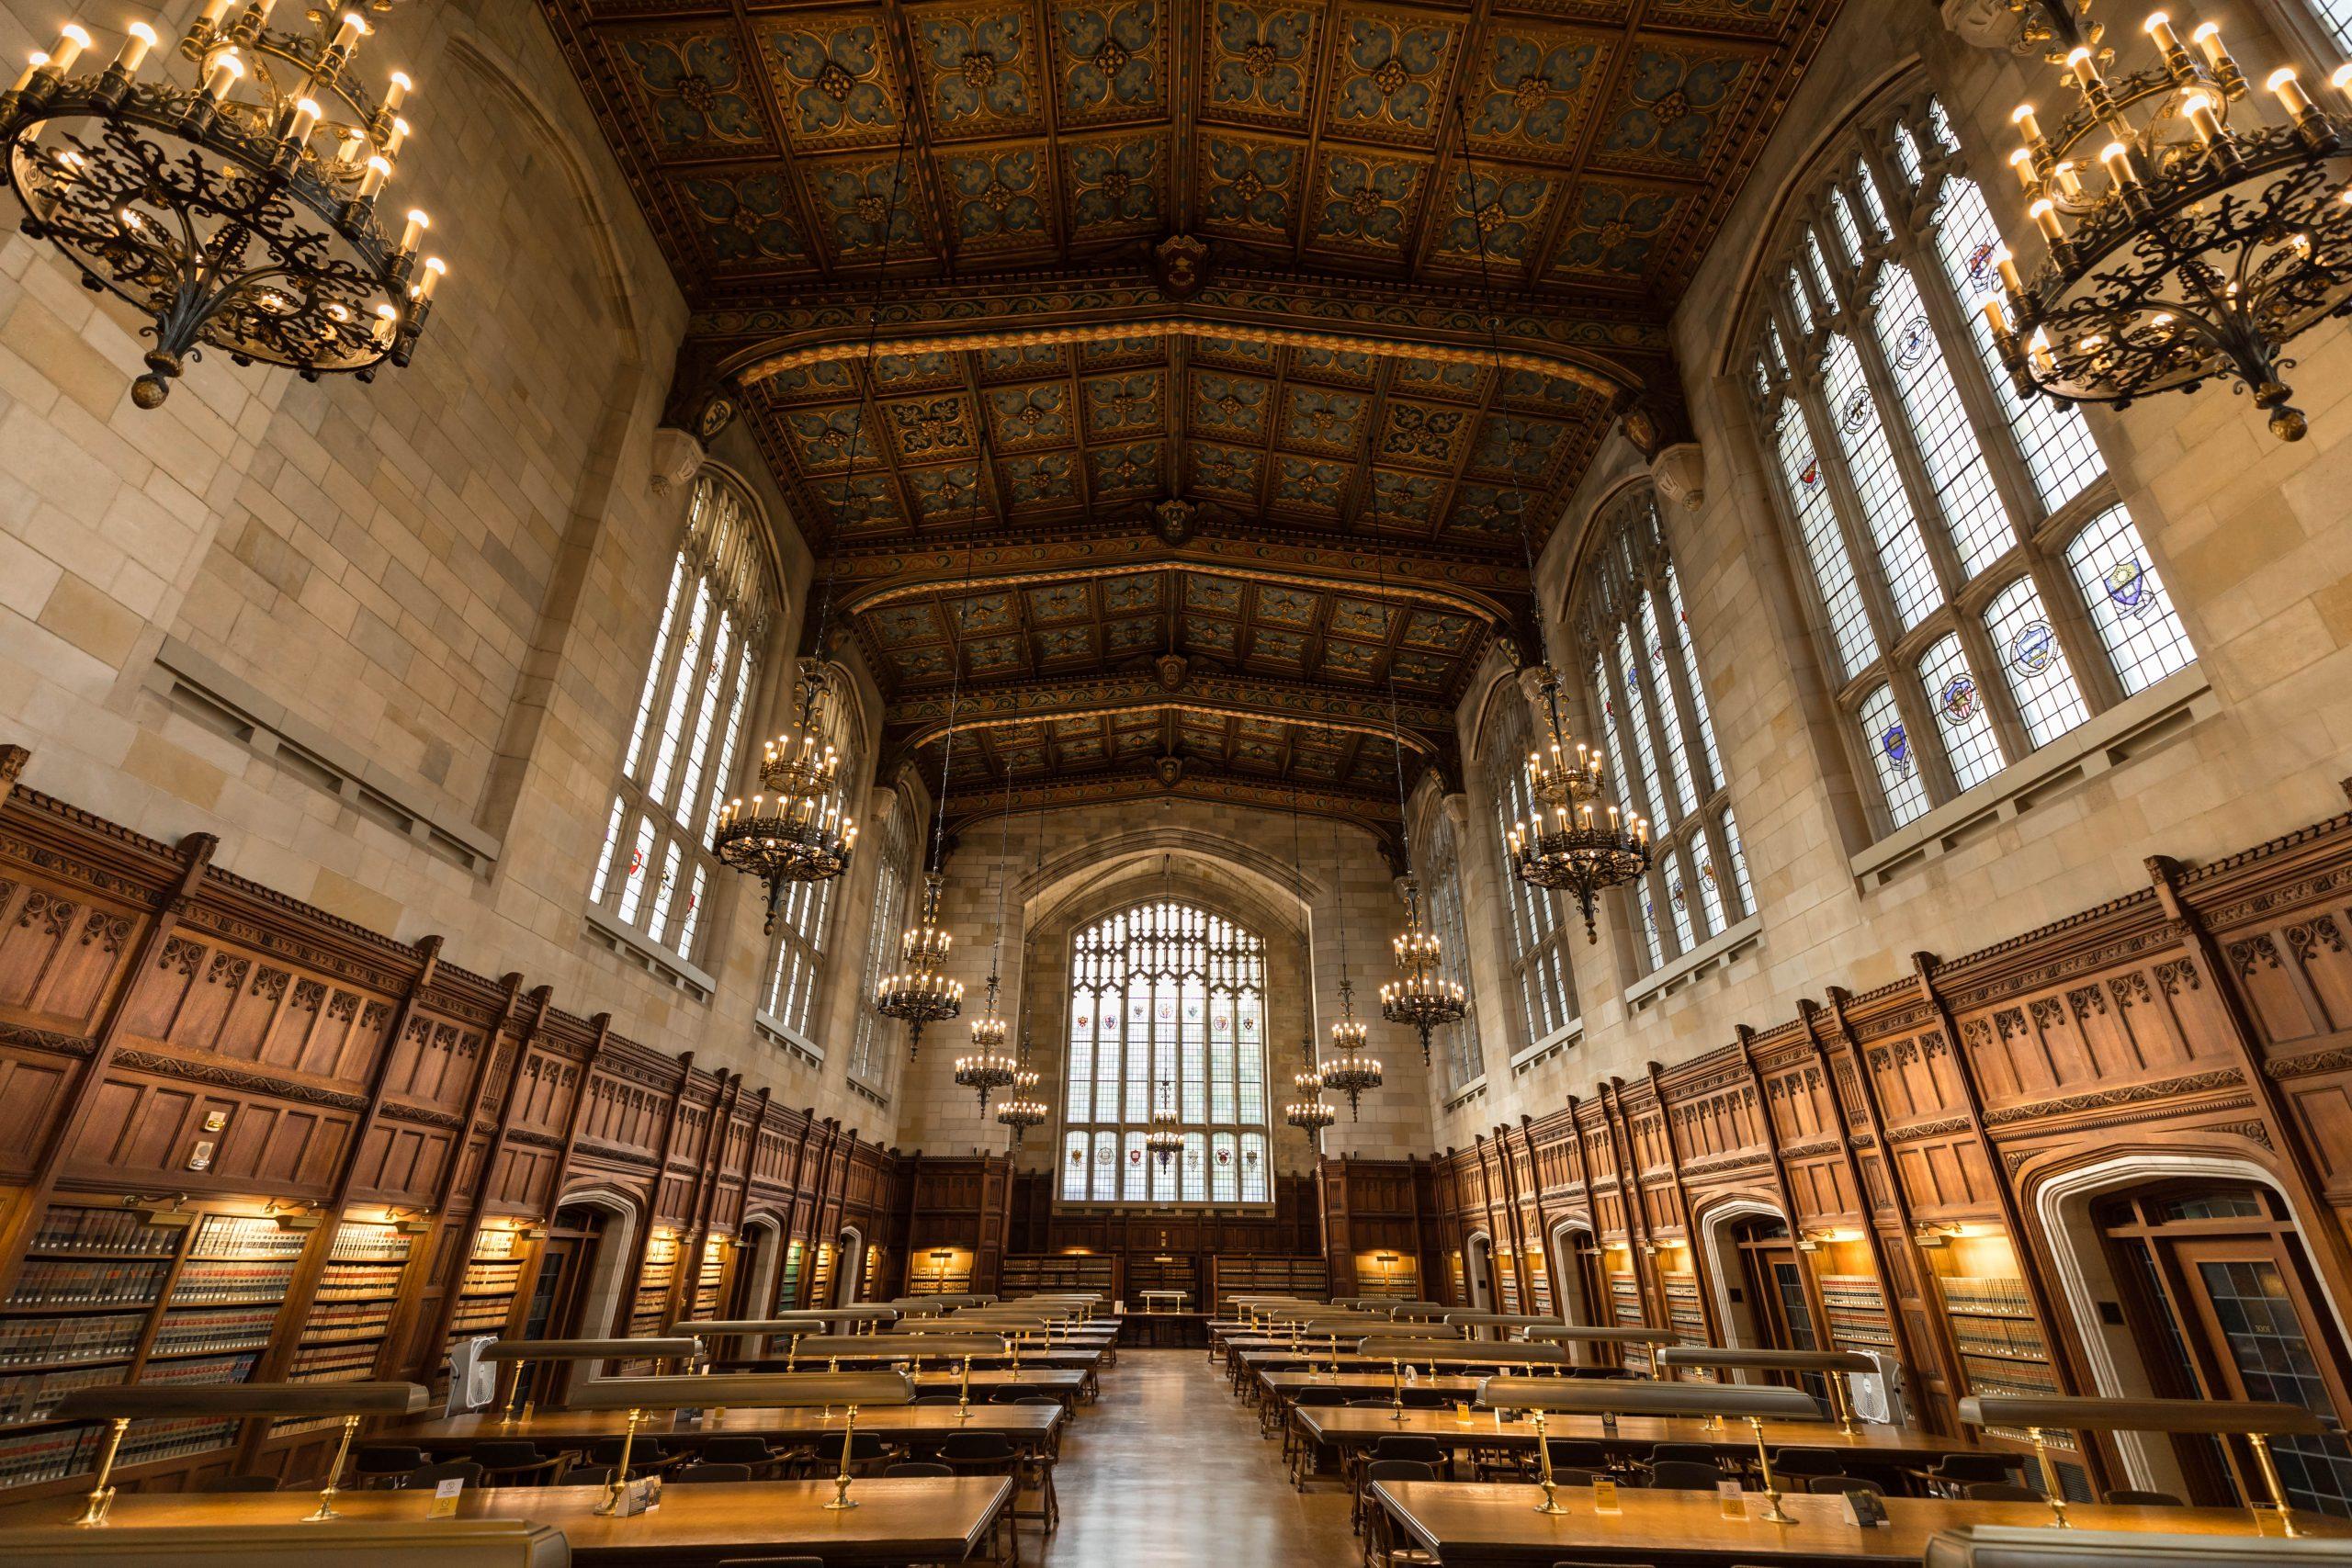 Ann Arbor University of Michigan Law Library by Annie Fairfax